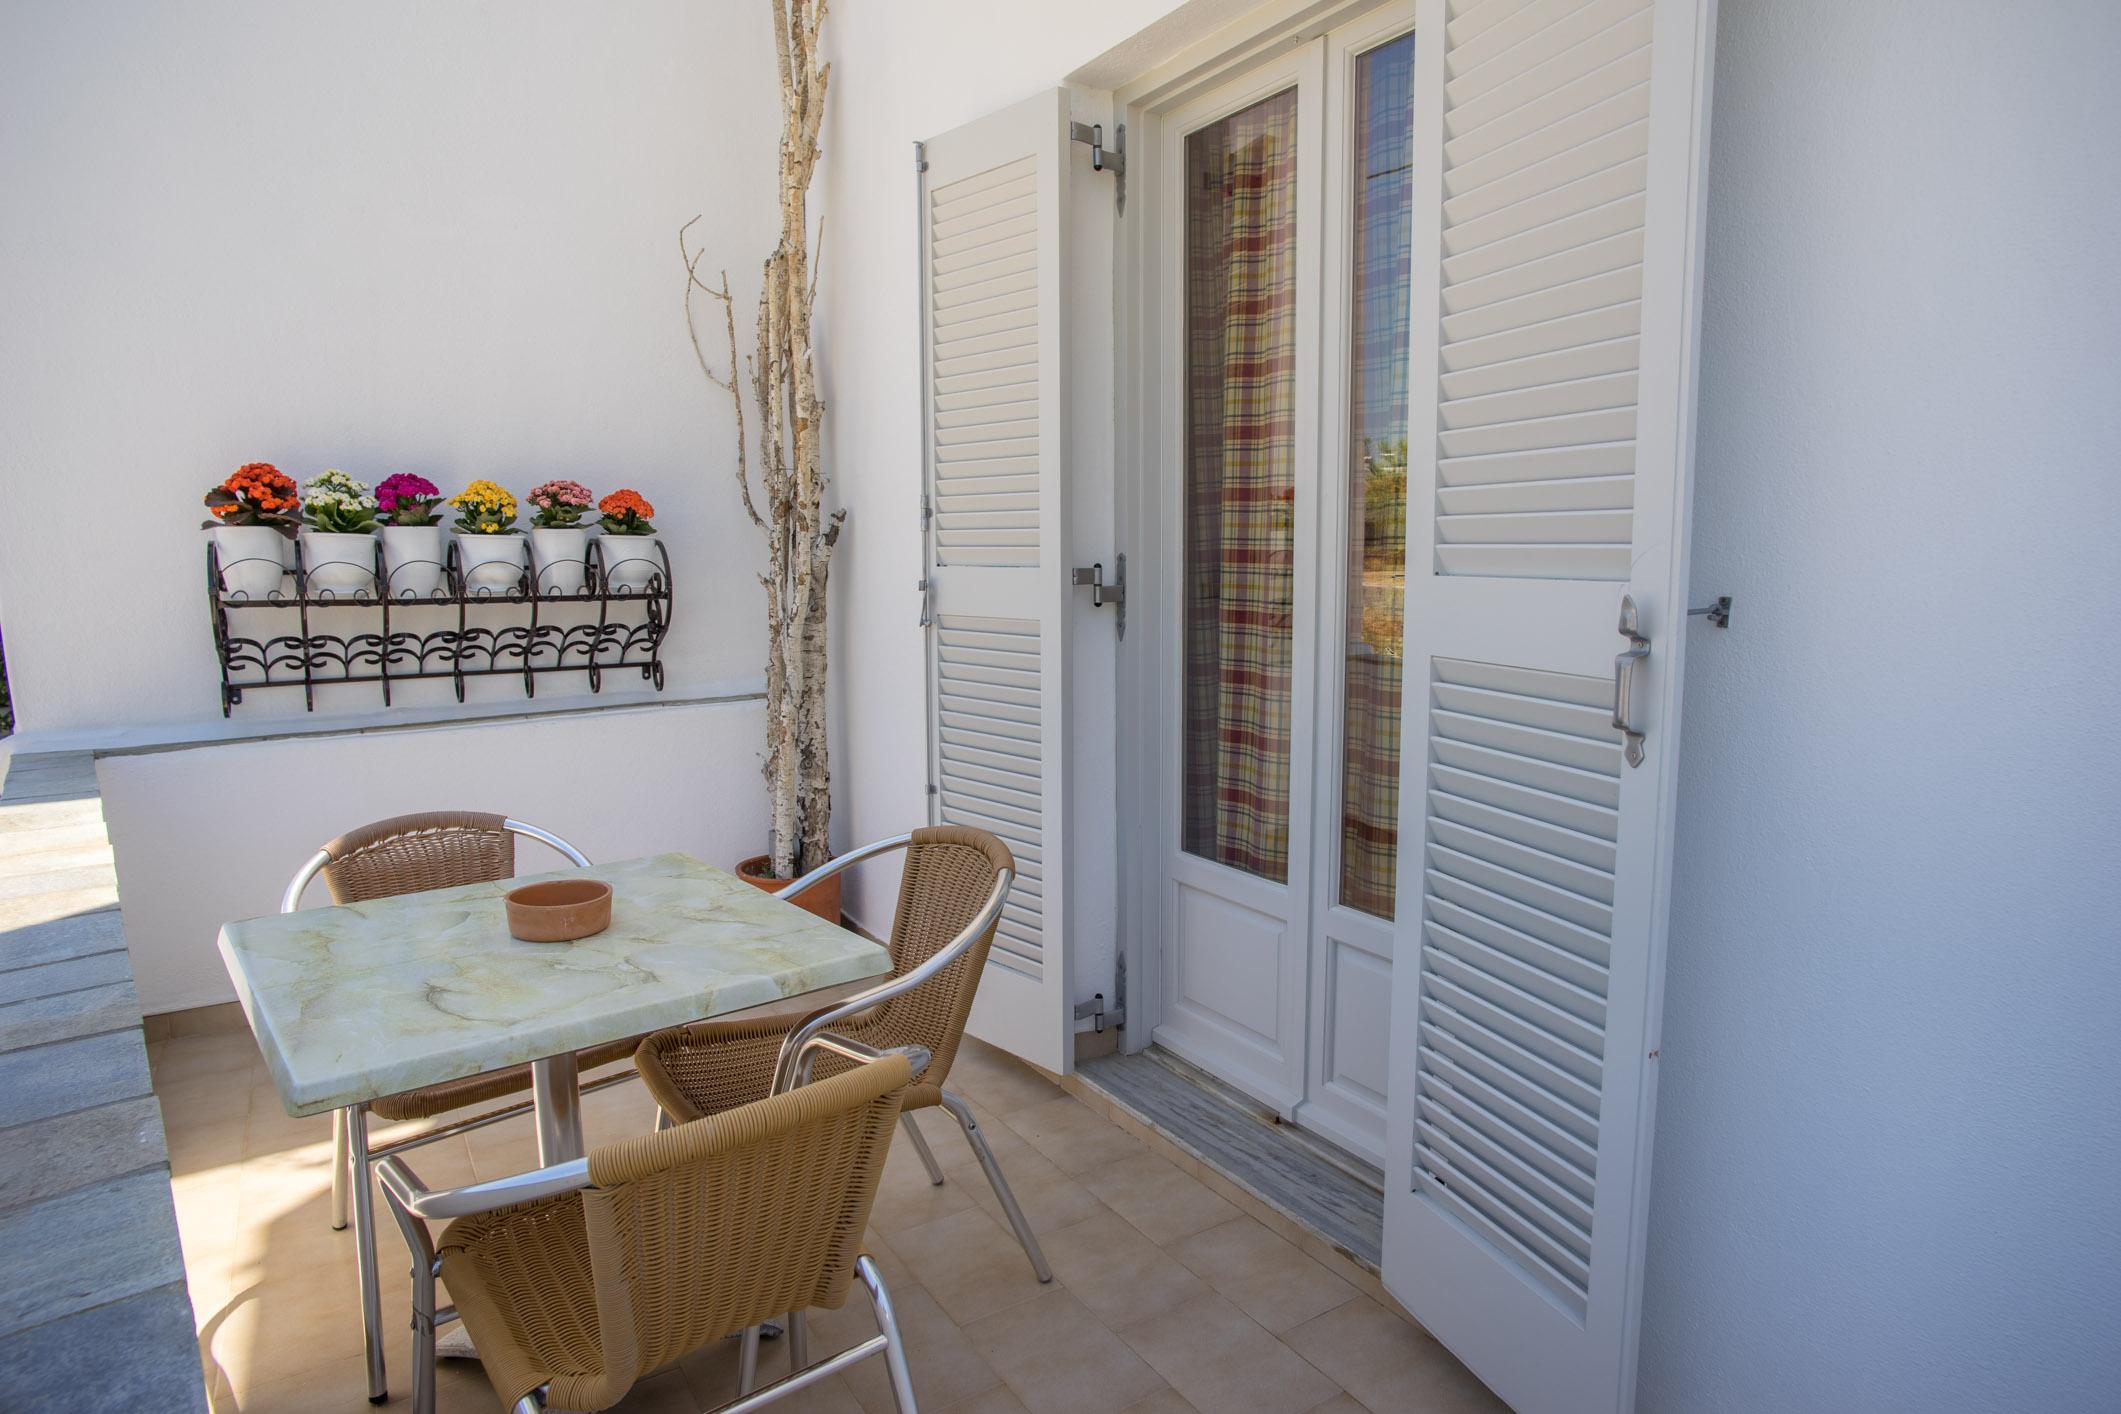 Accomodation Information Studios Cyclades Paros Greece